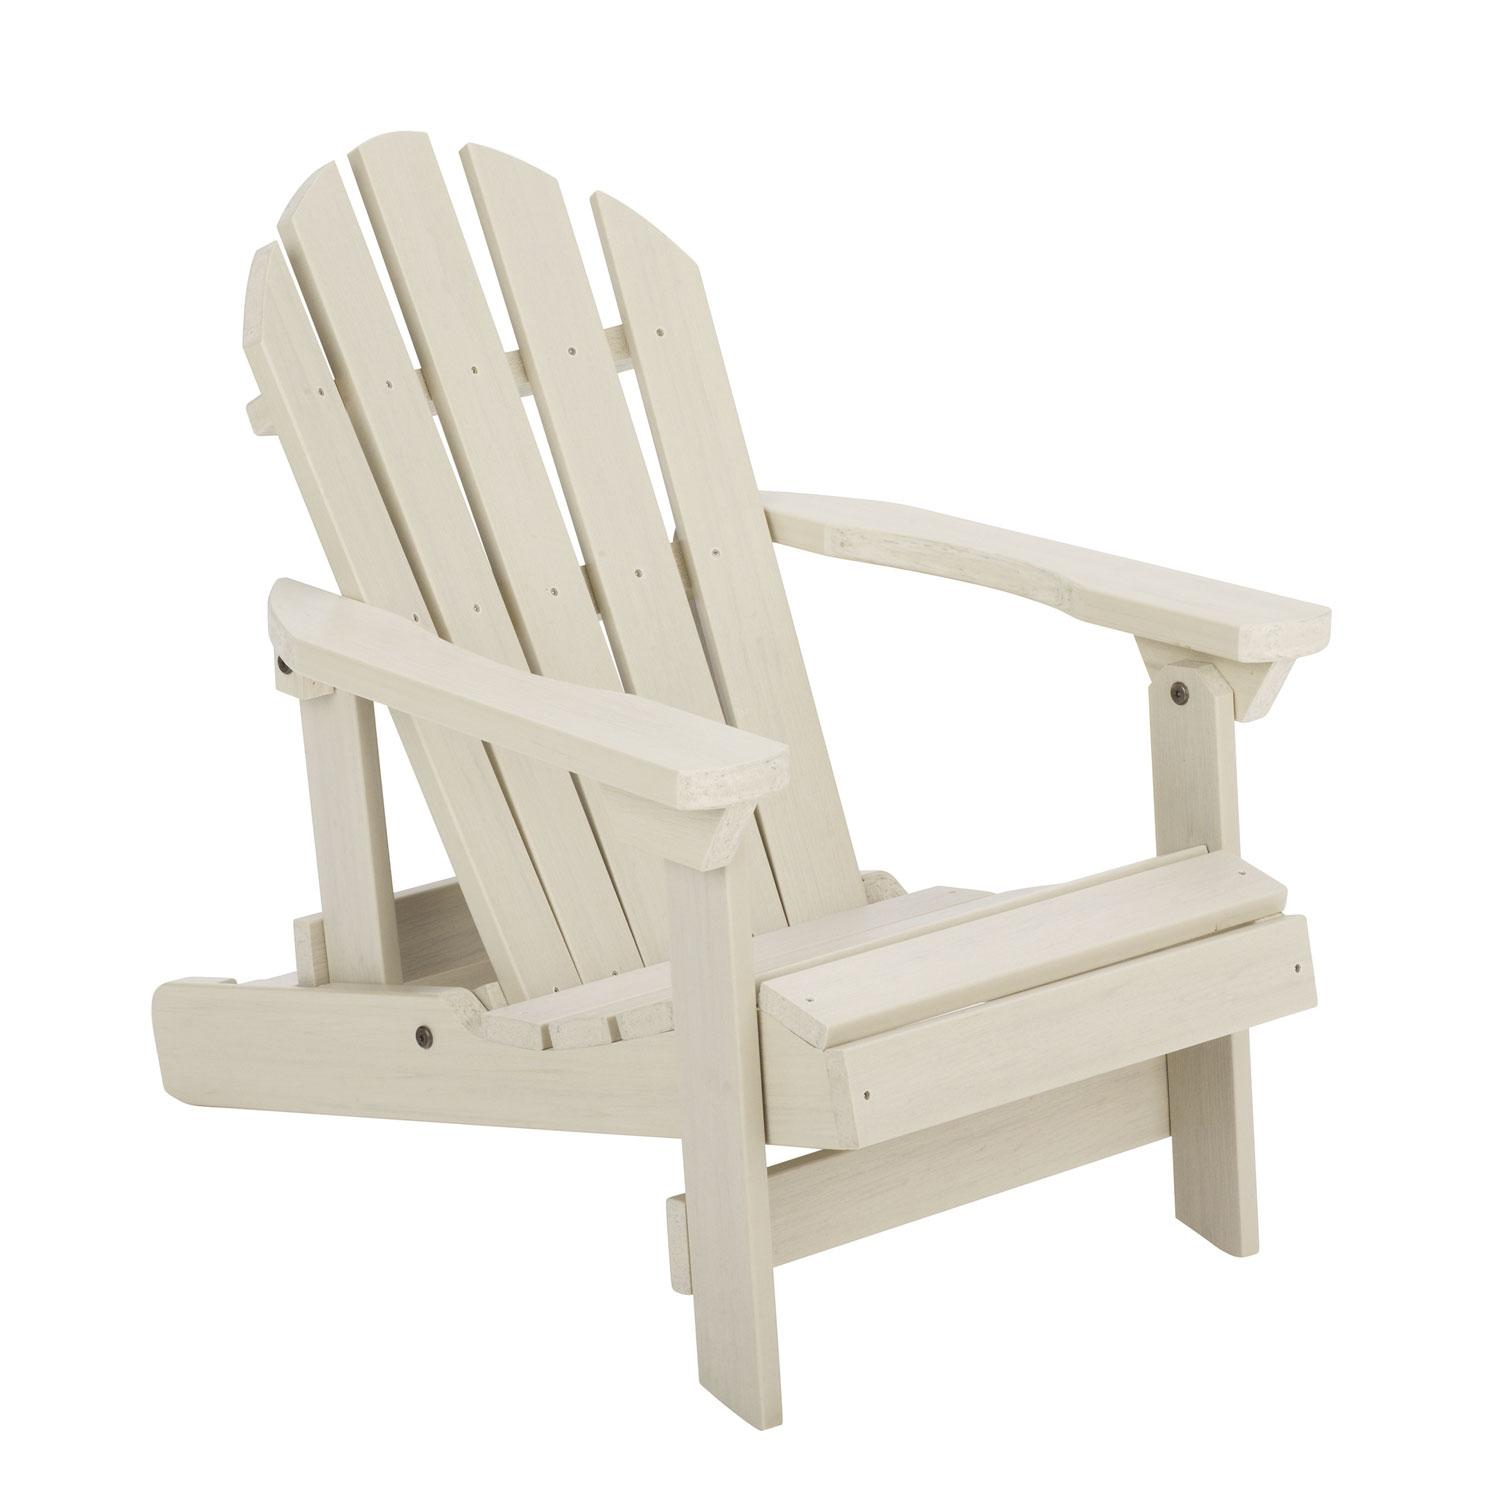 childrens adirondack chair plastic yellow and grey cushions company kids sand